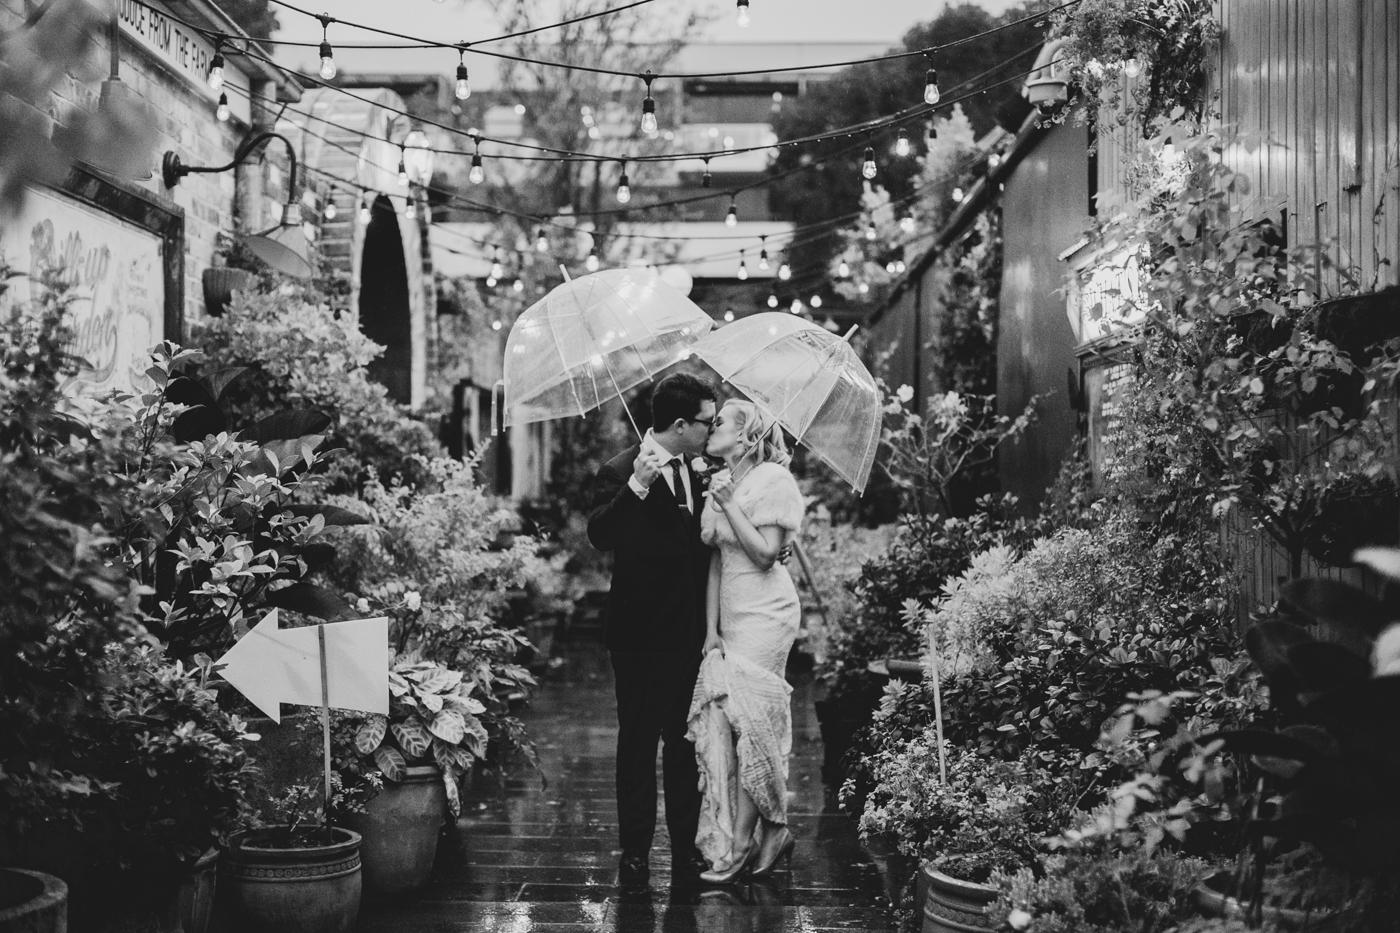 Jo & Tom Wedding - The Grounds of Alexandria - Samantha Heather Photography-252.jpg